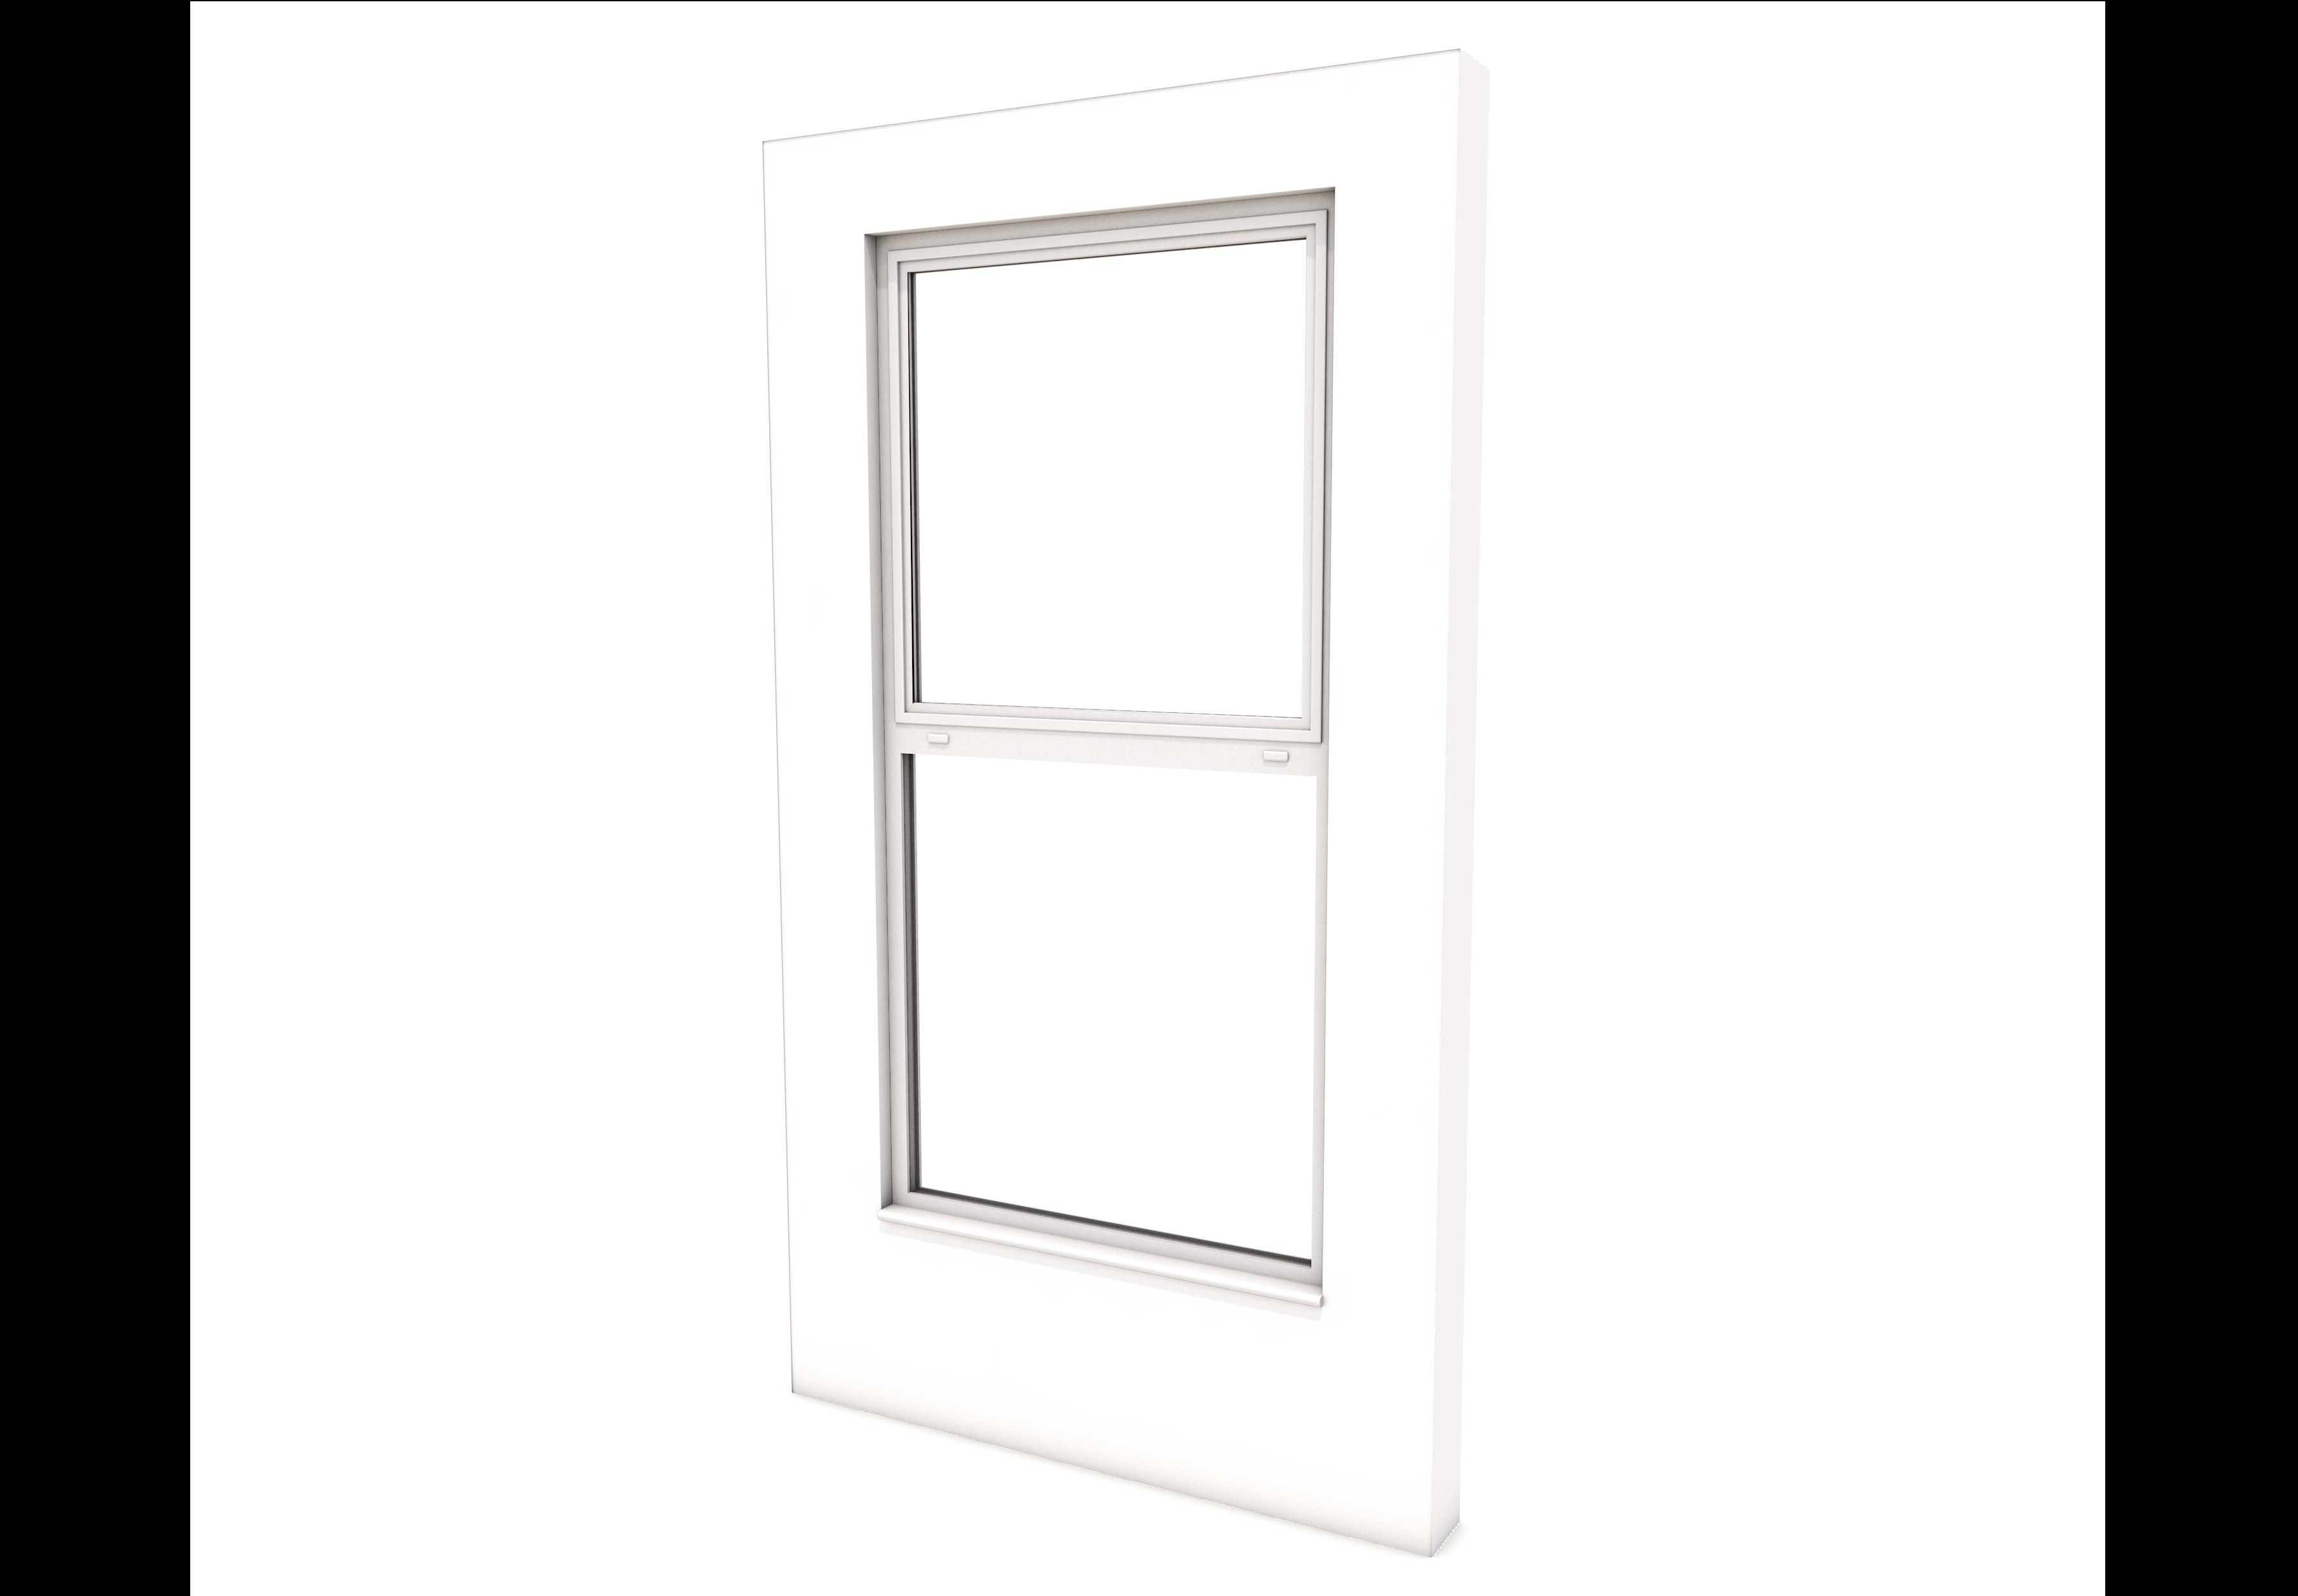 Smart Alitherm 300 Window - 600 x 1600 mm - Top Hinge